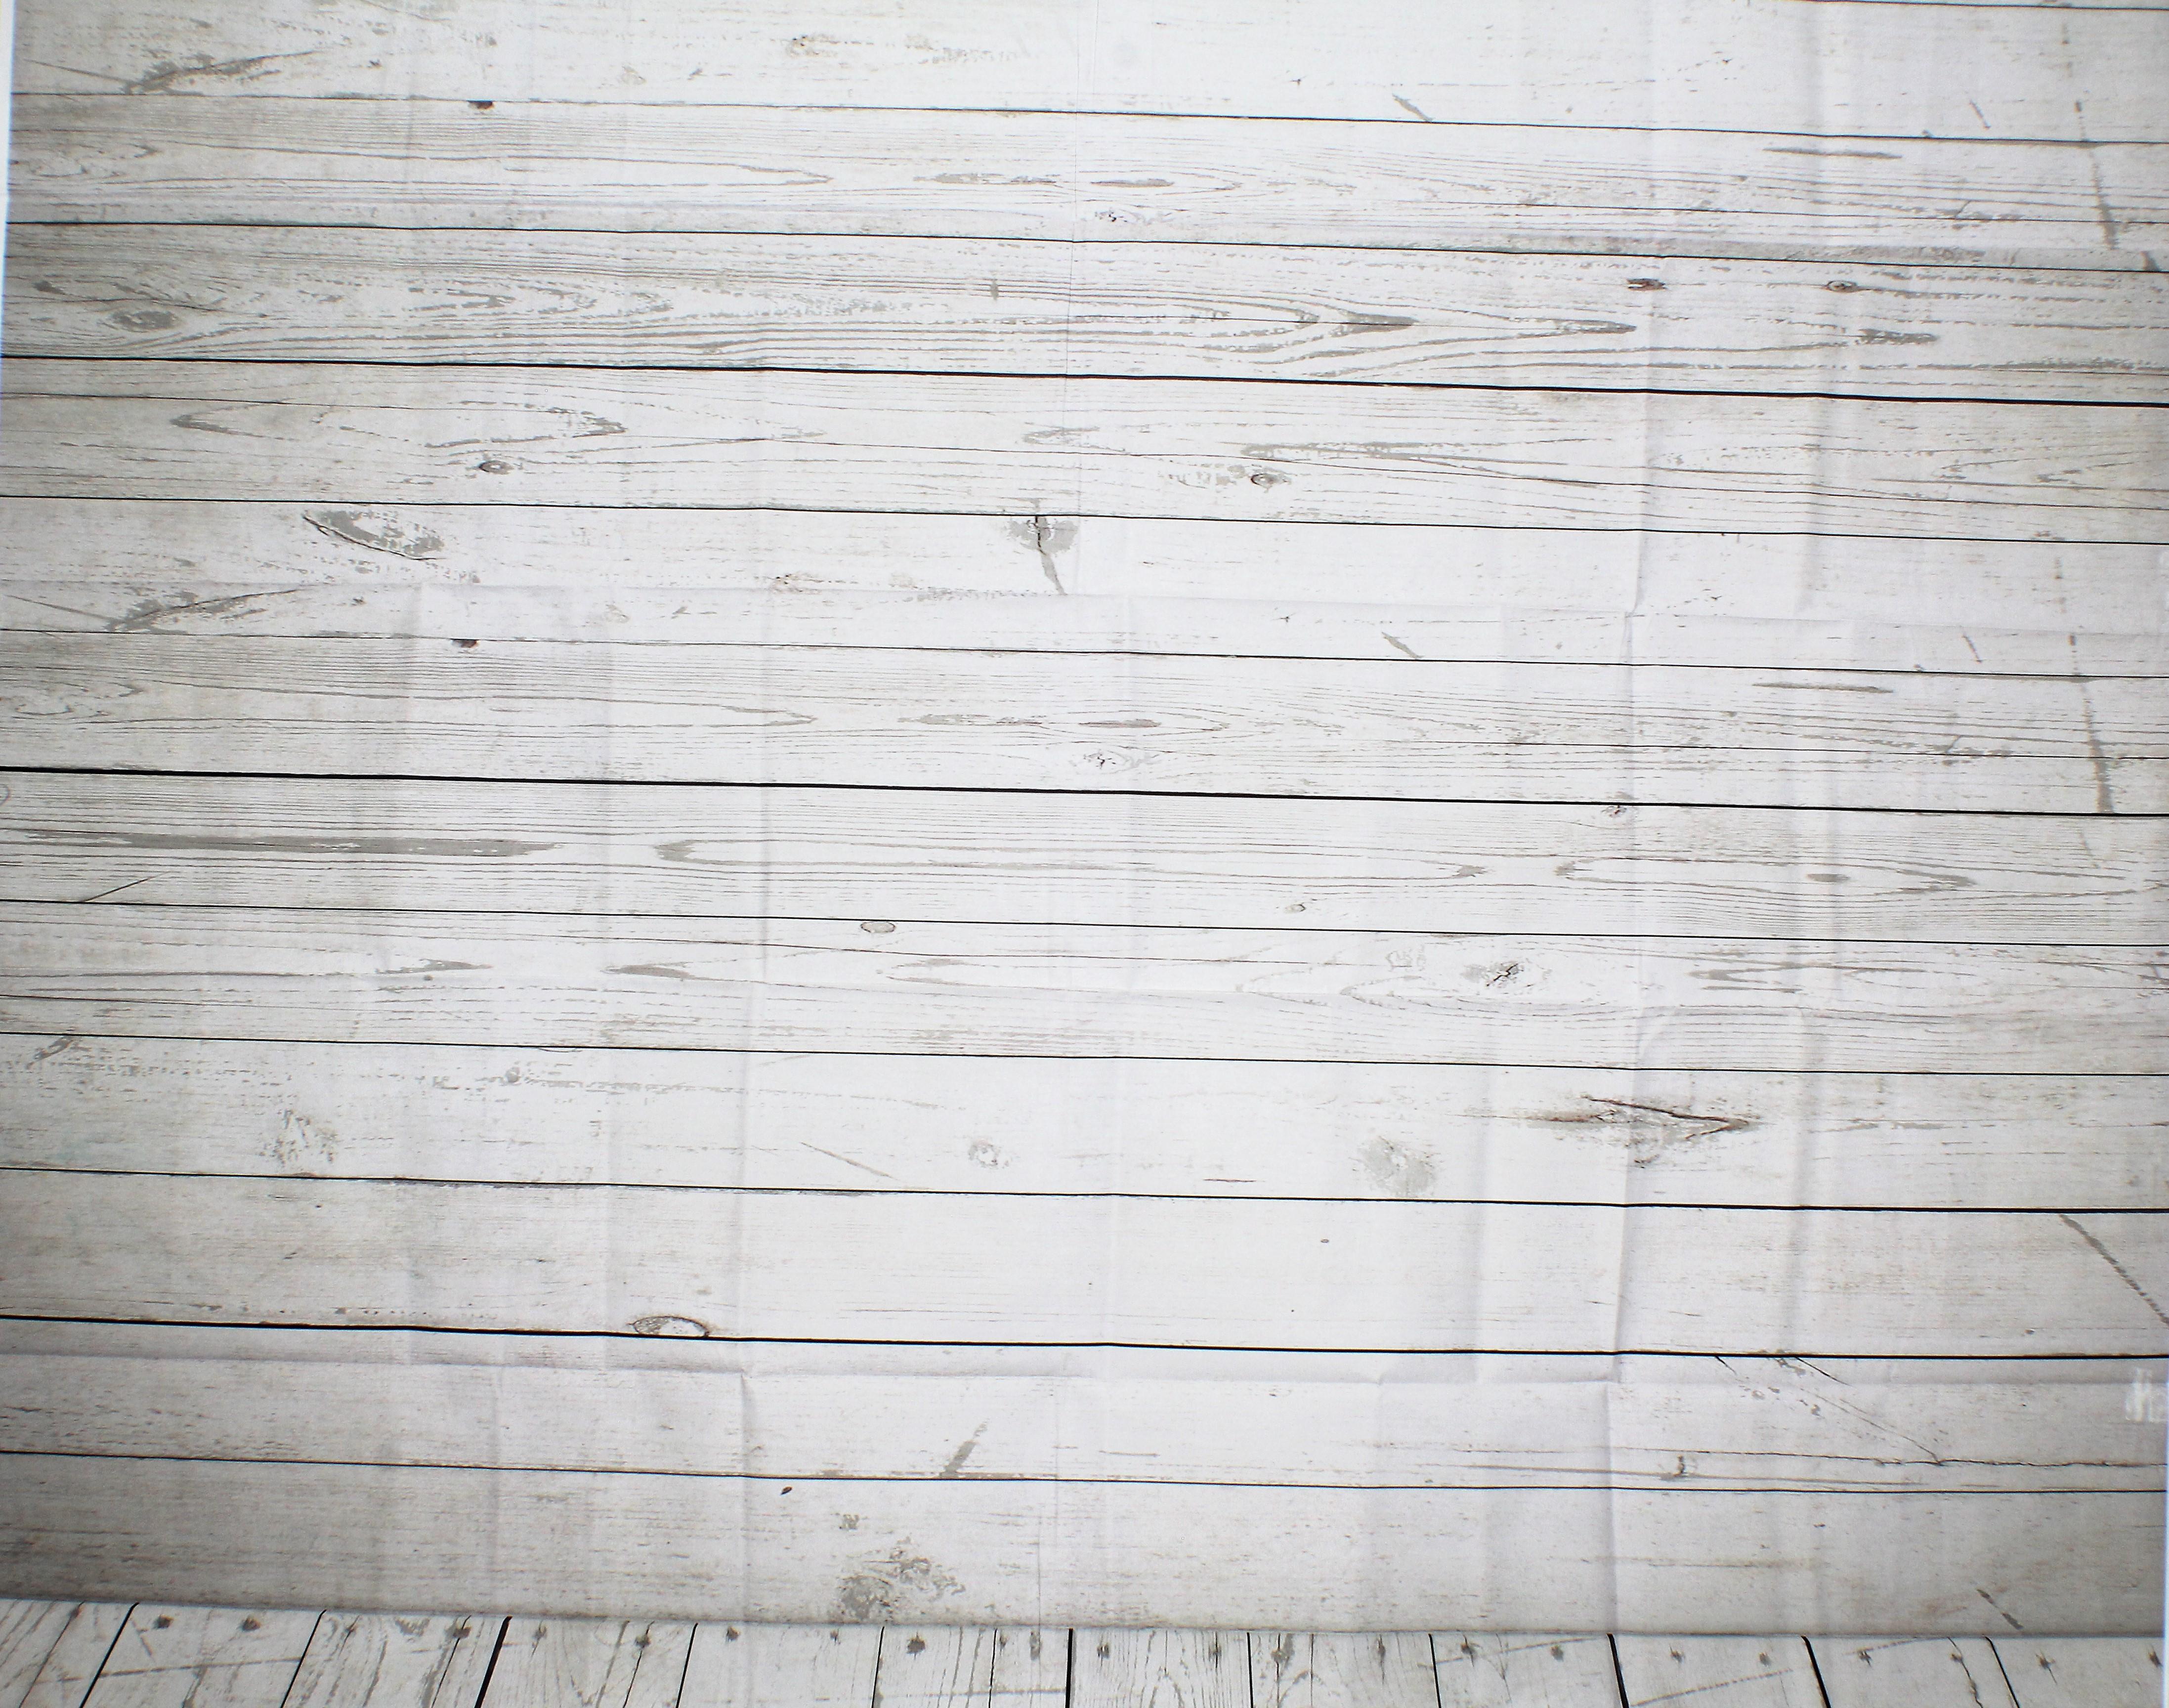 19 Light Wooden Panels